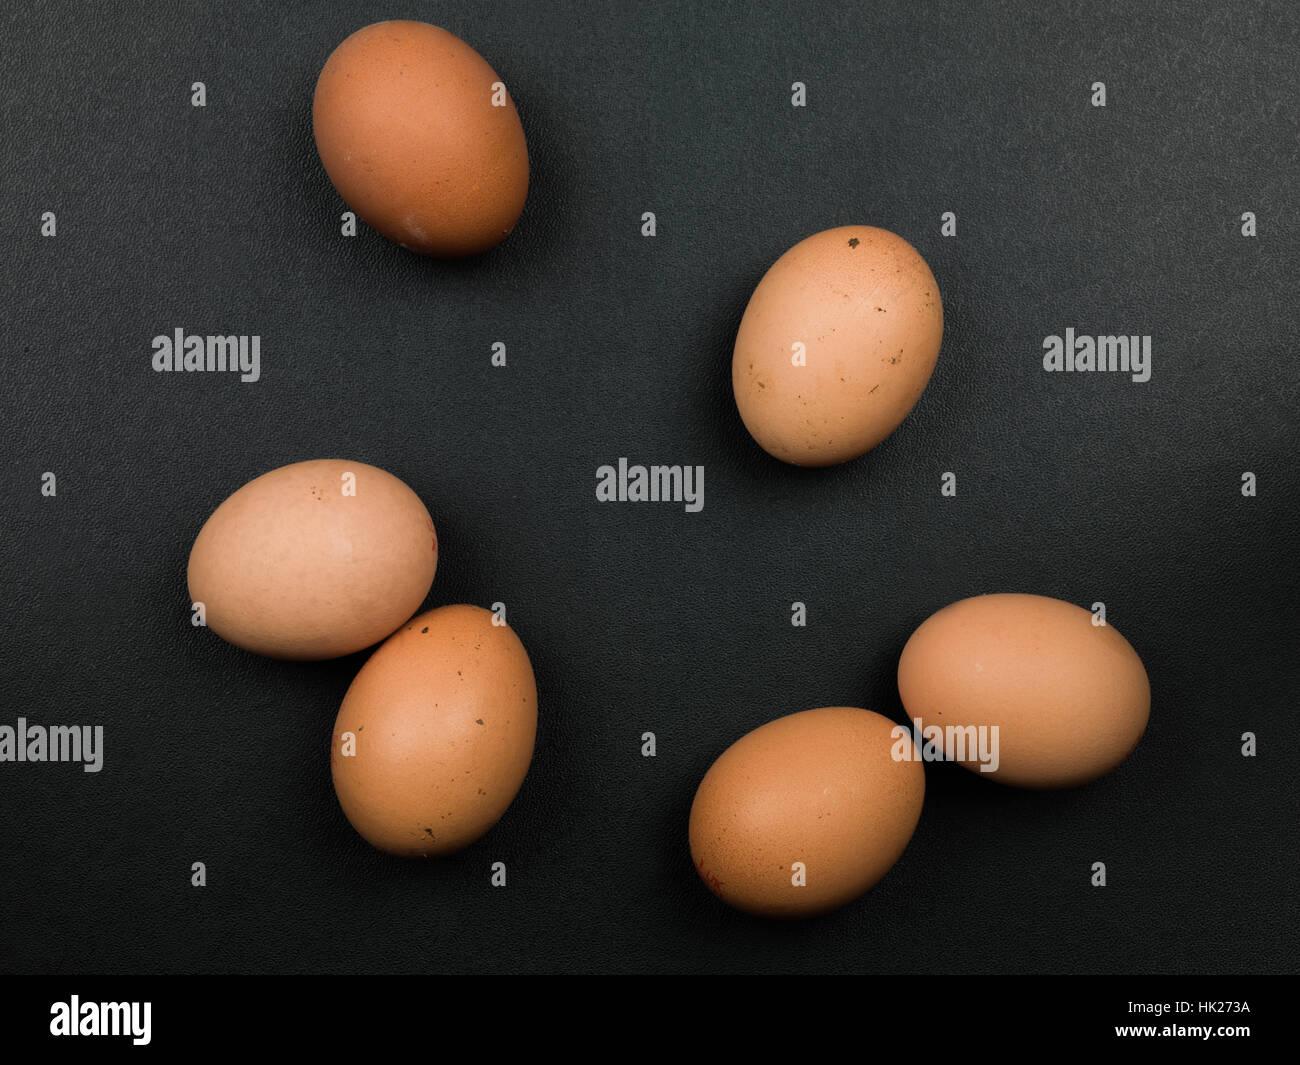 Six Fresh Uncooked Brown Hens Eggs - Stock Image